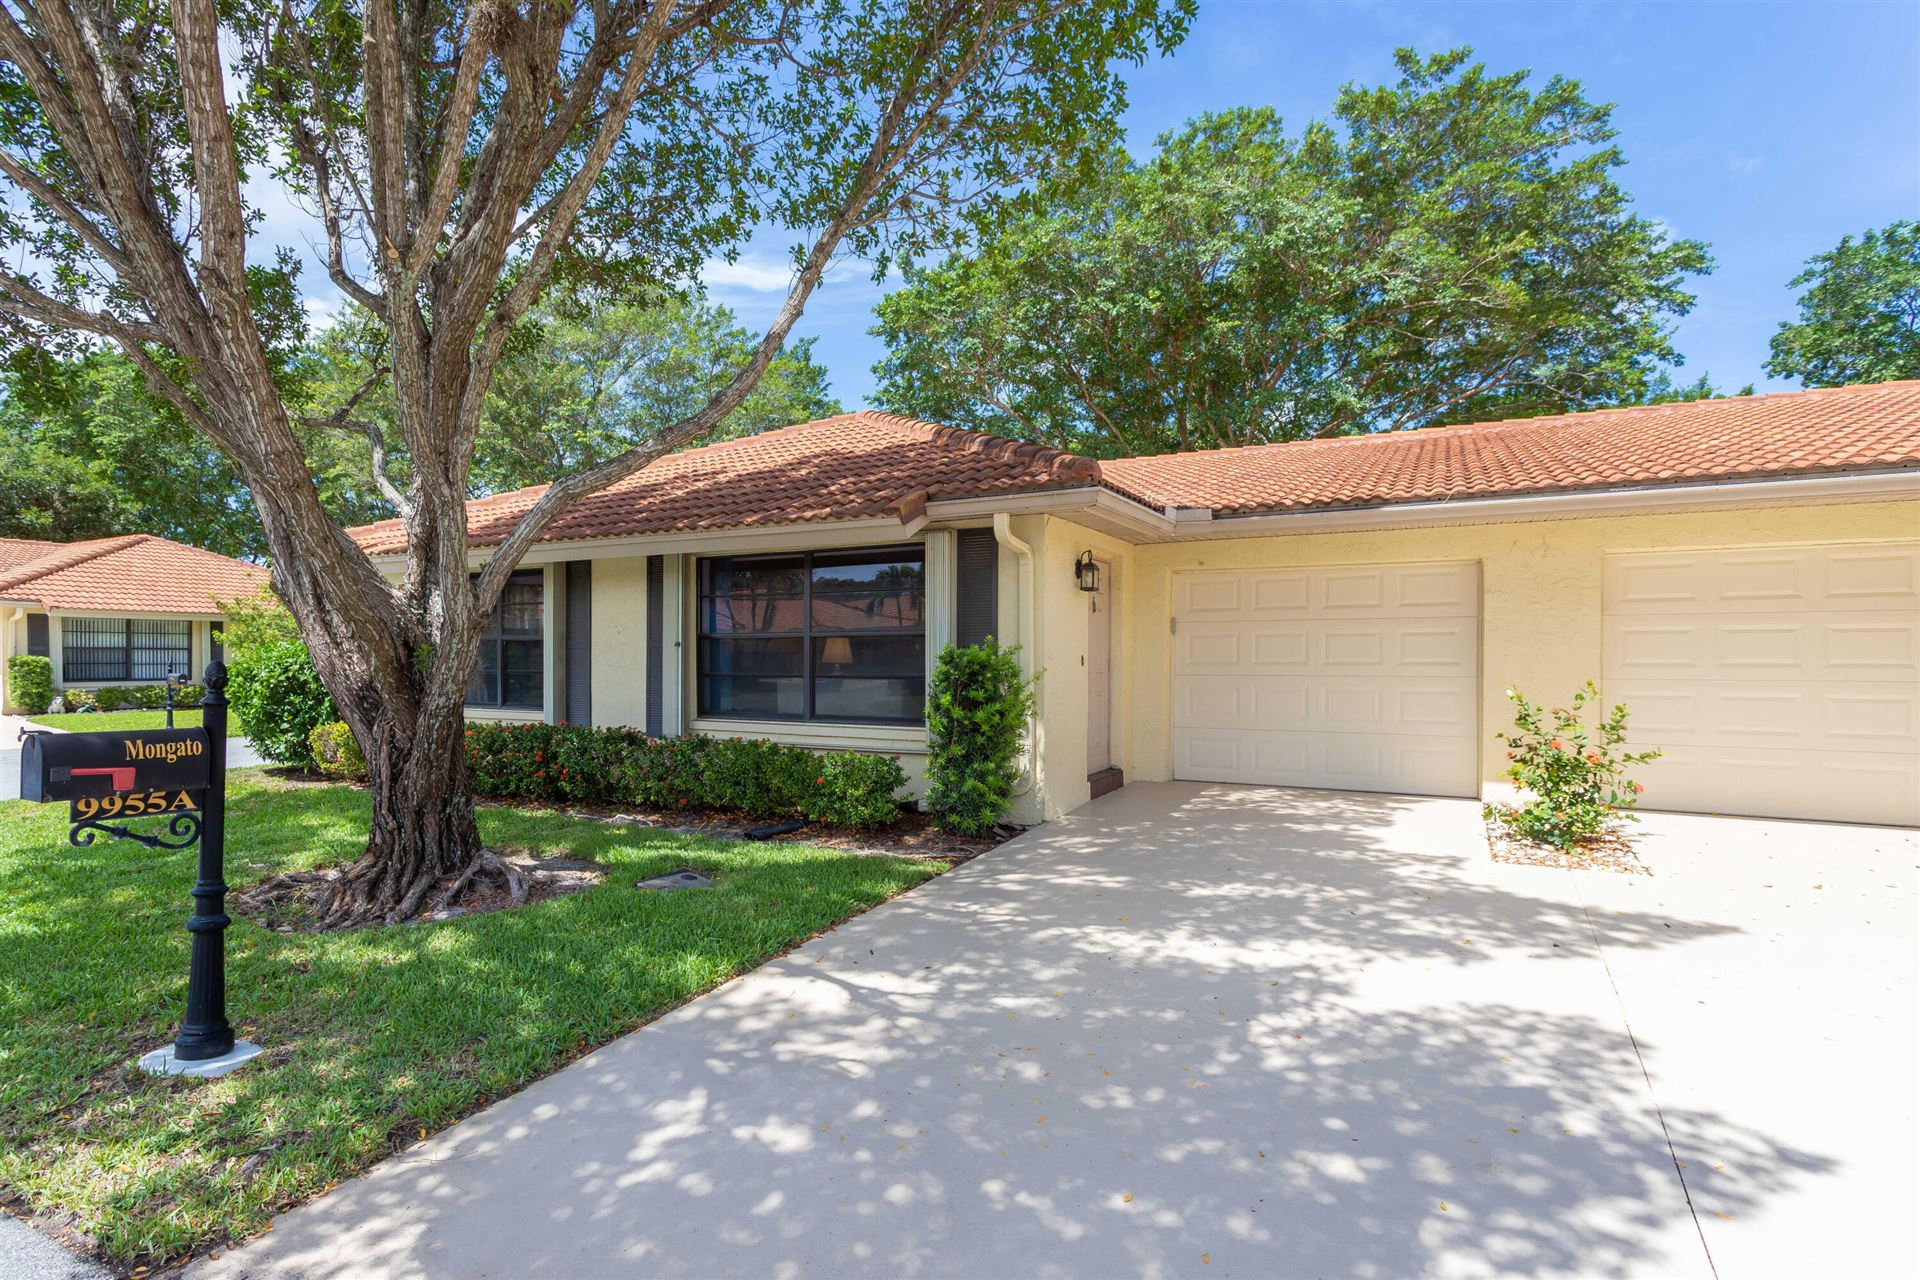 9955 Pyracantha Tree Terrace #A, Boynton Beach, FL 33436 - MLS#: RX-10732166